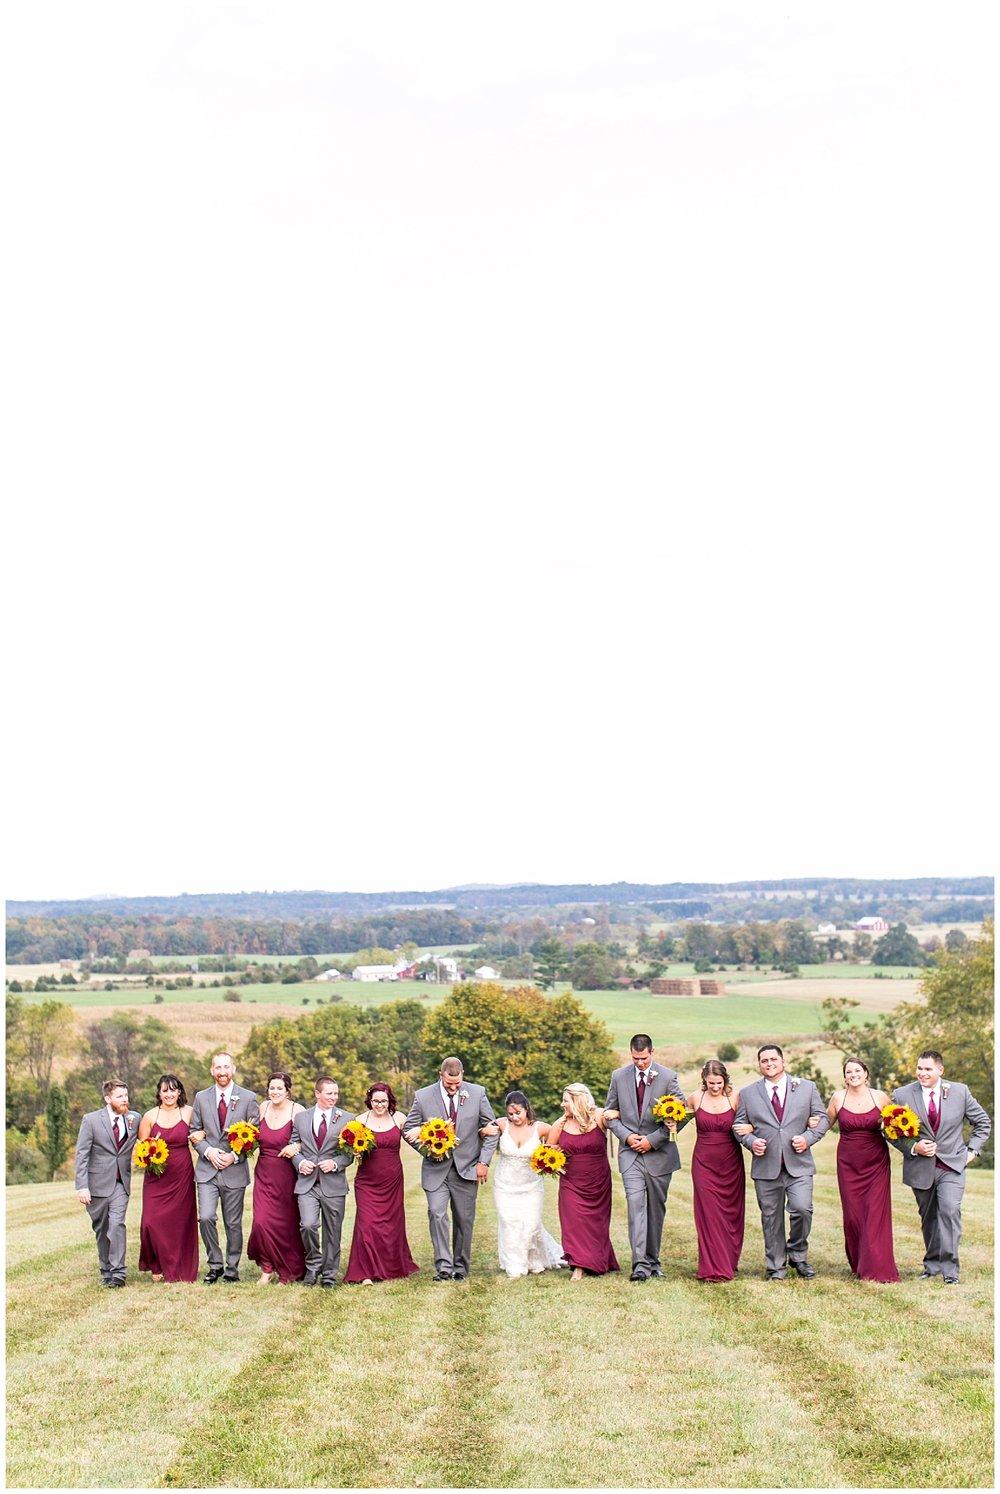 M+K Lodges at Gettysburg Wedding LivingRadiantPhotographyphotos_0023.jpg